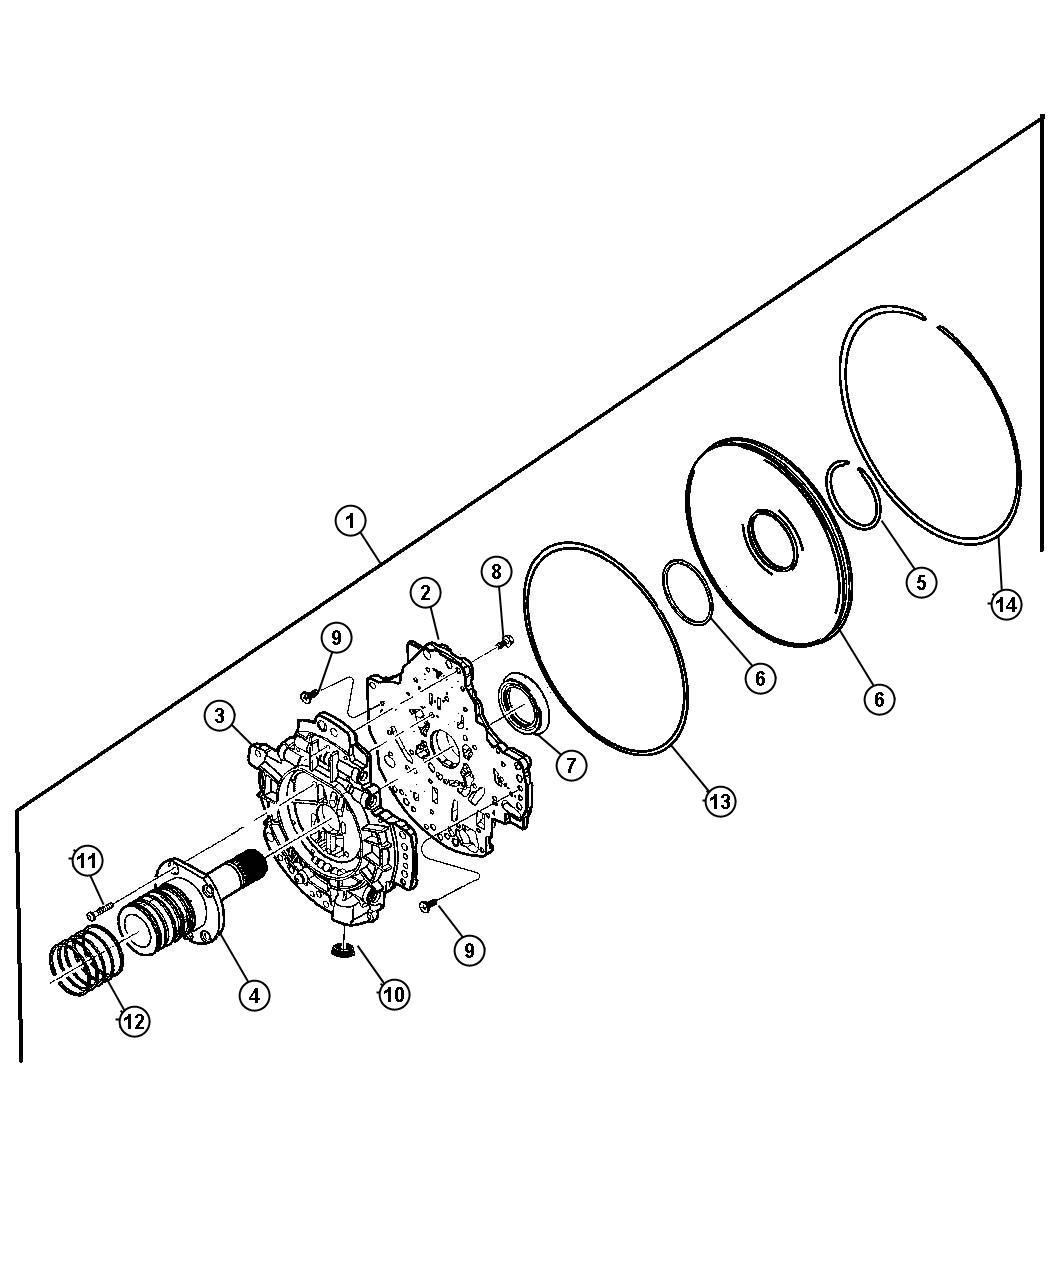 Dodge Ram 1500 Pump kit. Transmission oil. Axle, automatic